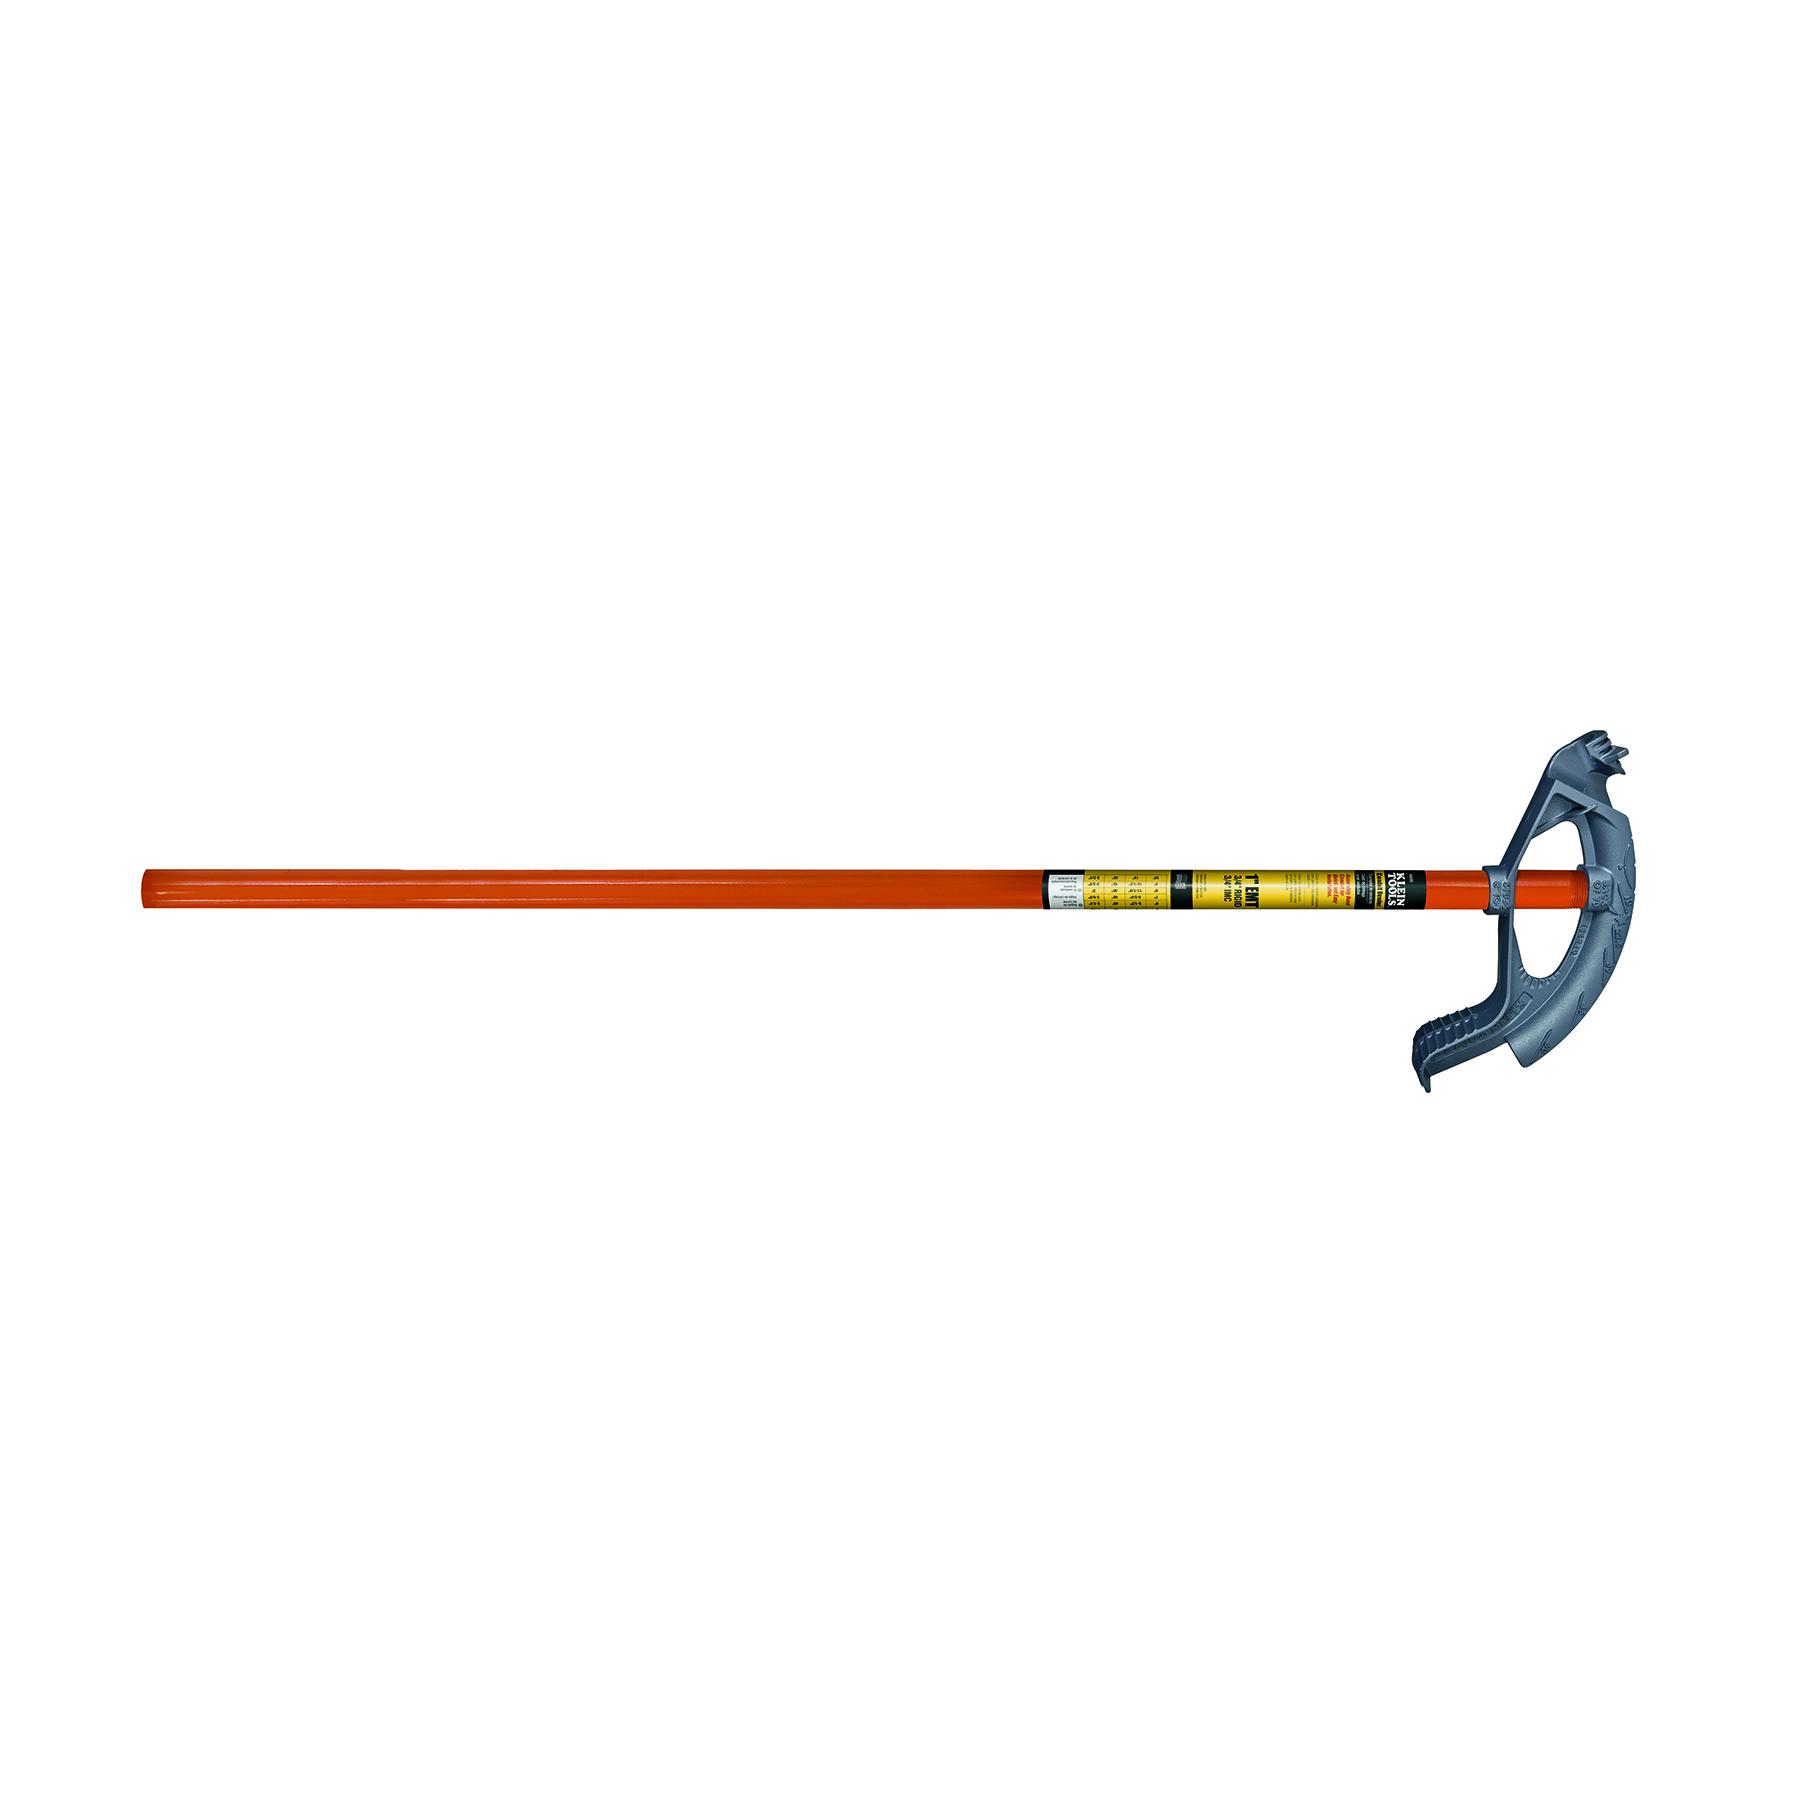 klein tools conduit bender instructions